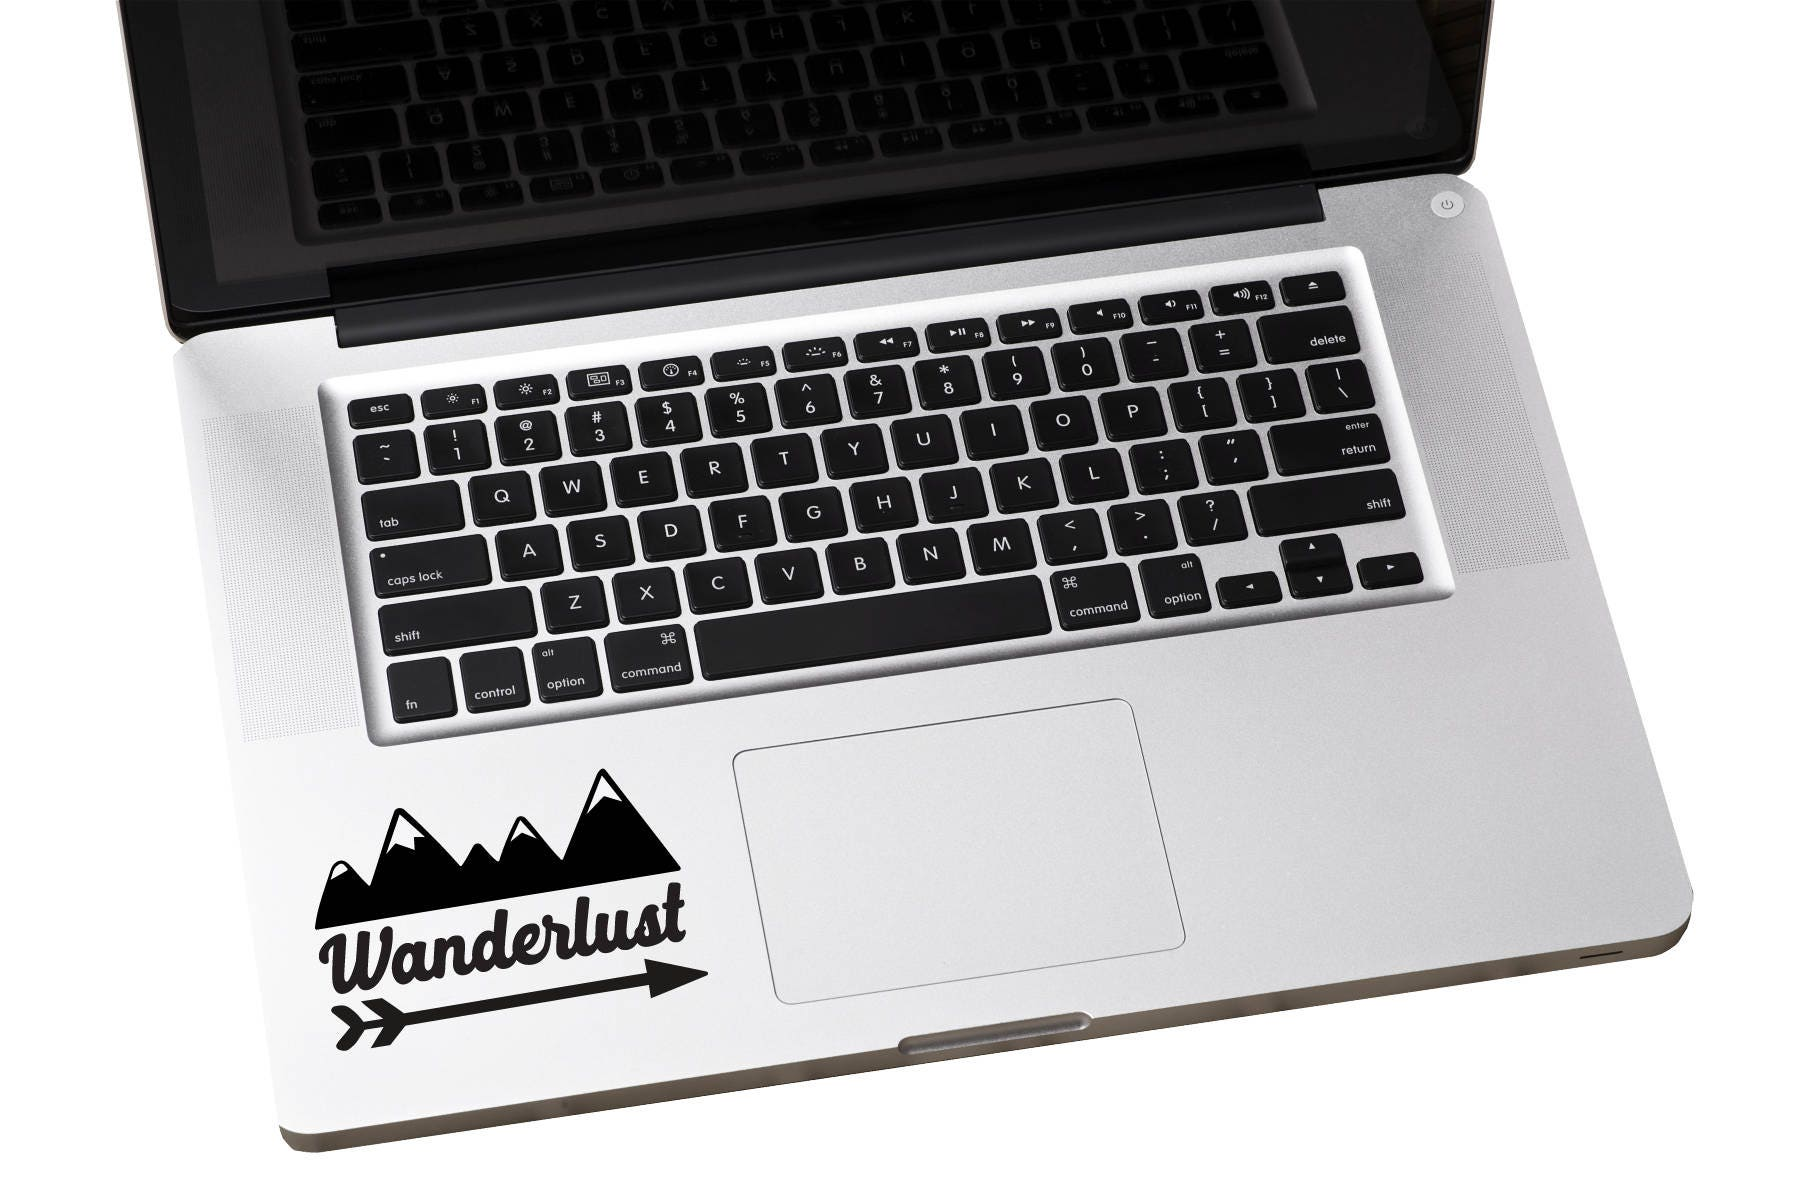 Wanderlust Decal Sticker Travel Adventure Laptop Sticker MacBook Sticker Tablet Sticker Inspirational Decal Travel Lover Gift